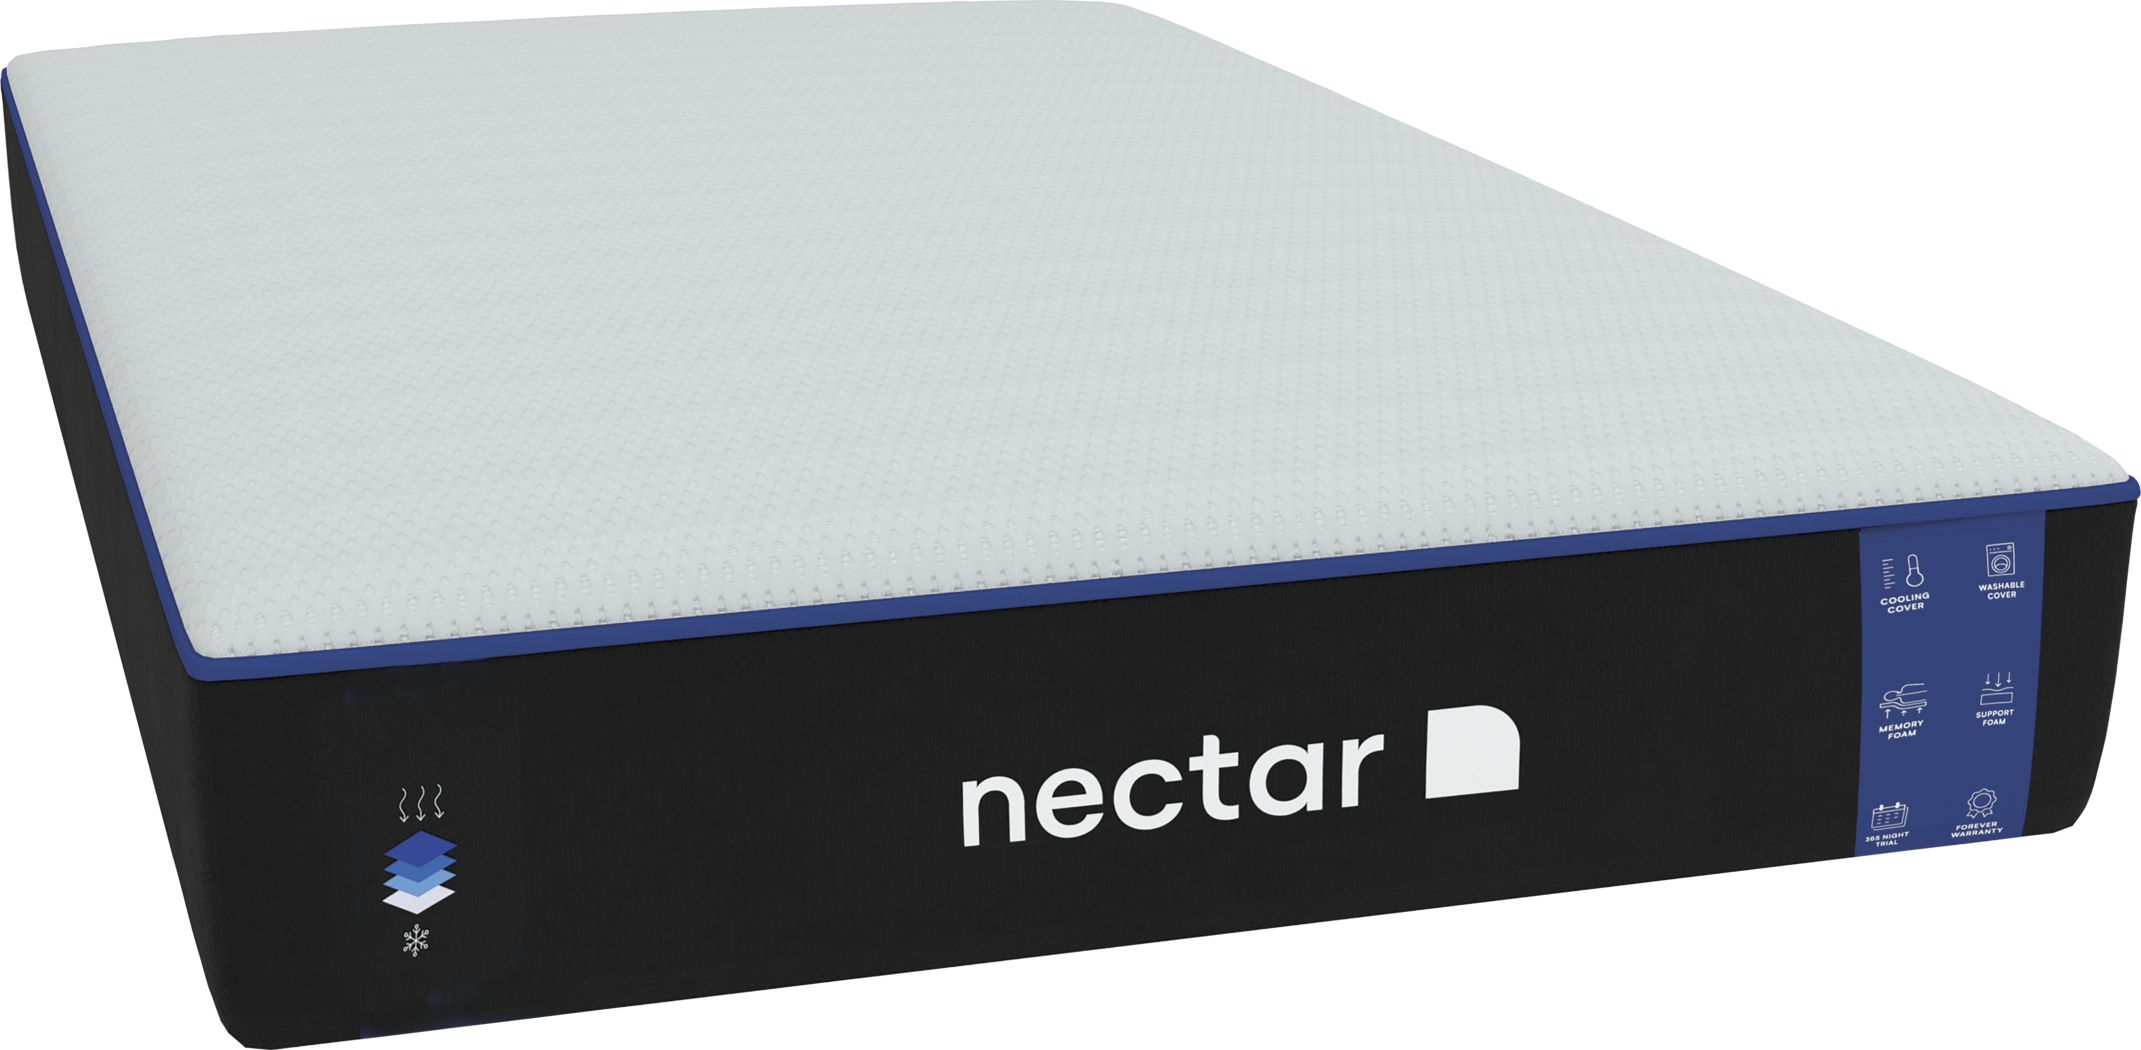 Nectar Classic King Mattress